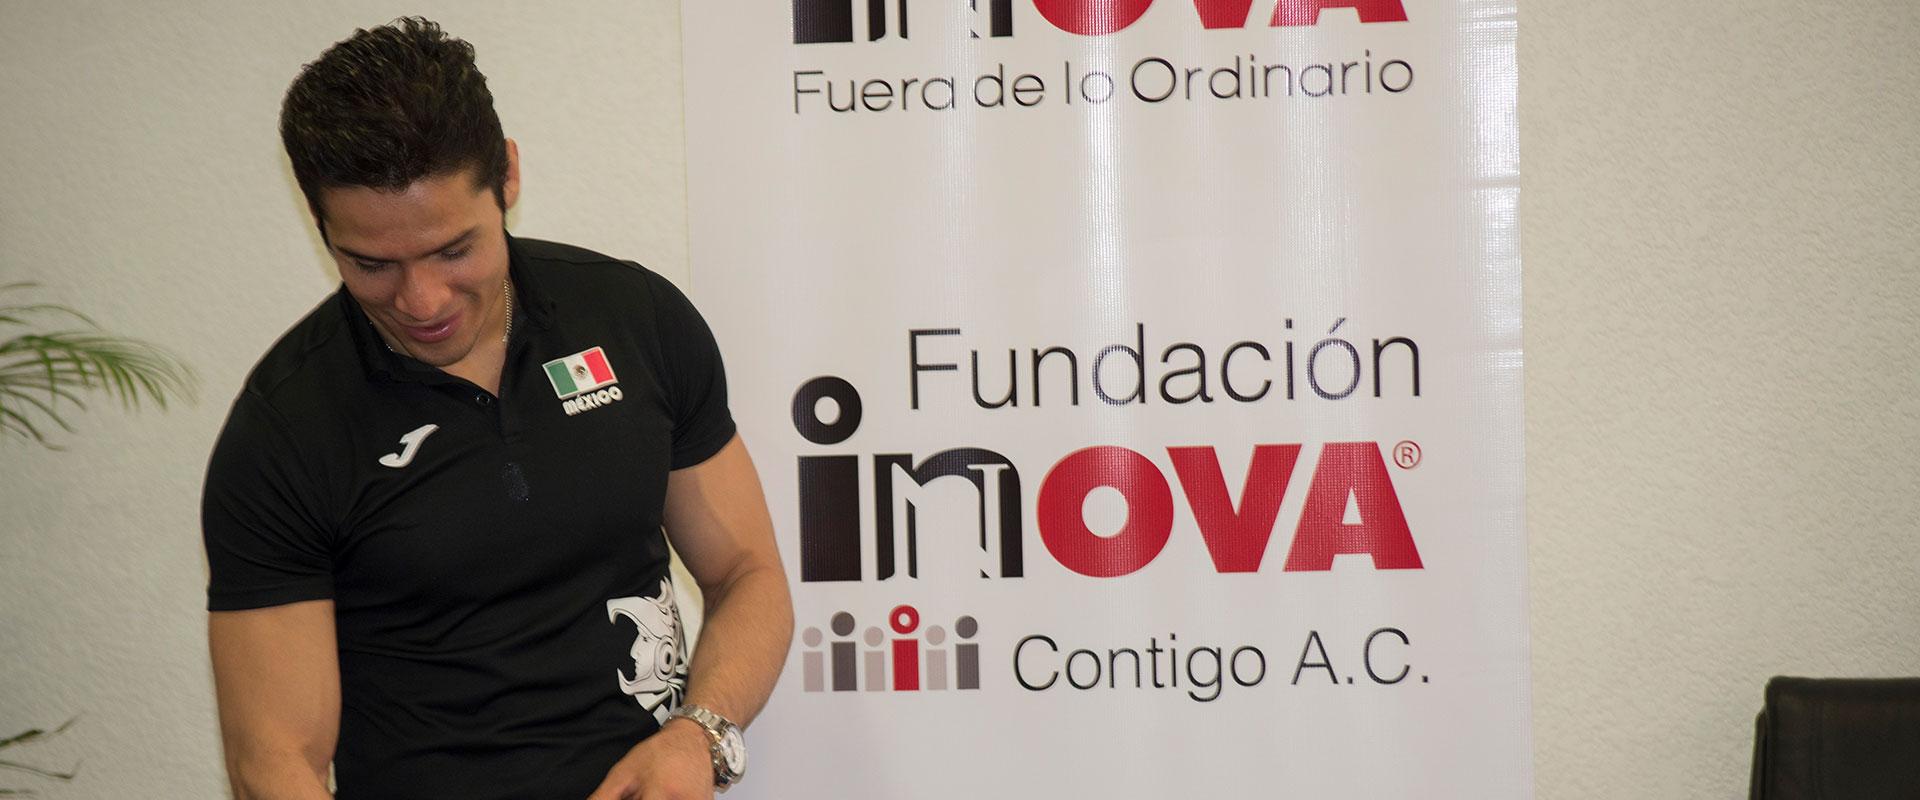 Representante de Fundación Inova en la Asociación para evitar la Ceguera en México, I.A.P.